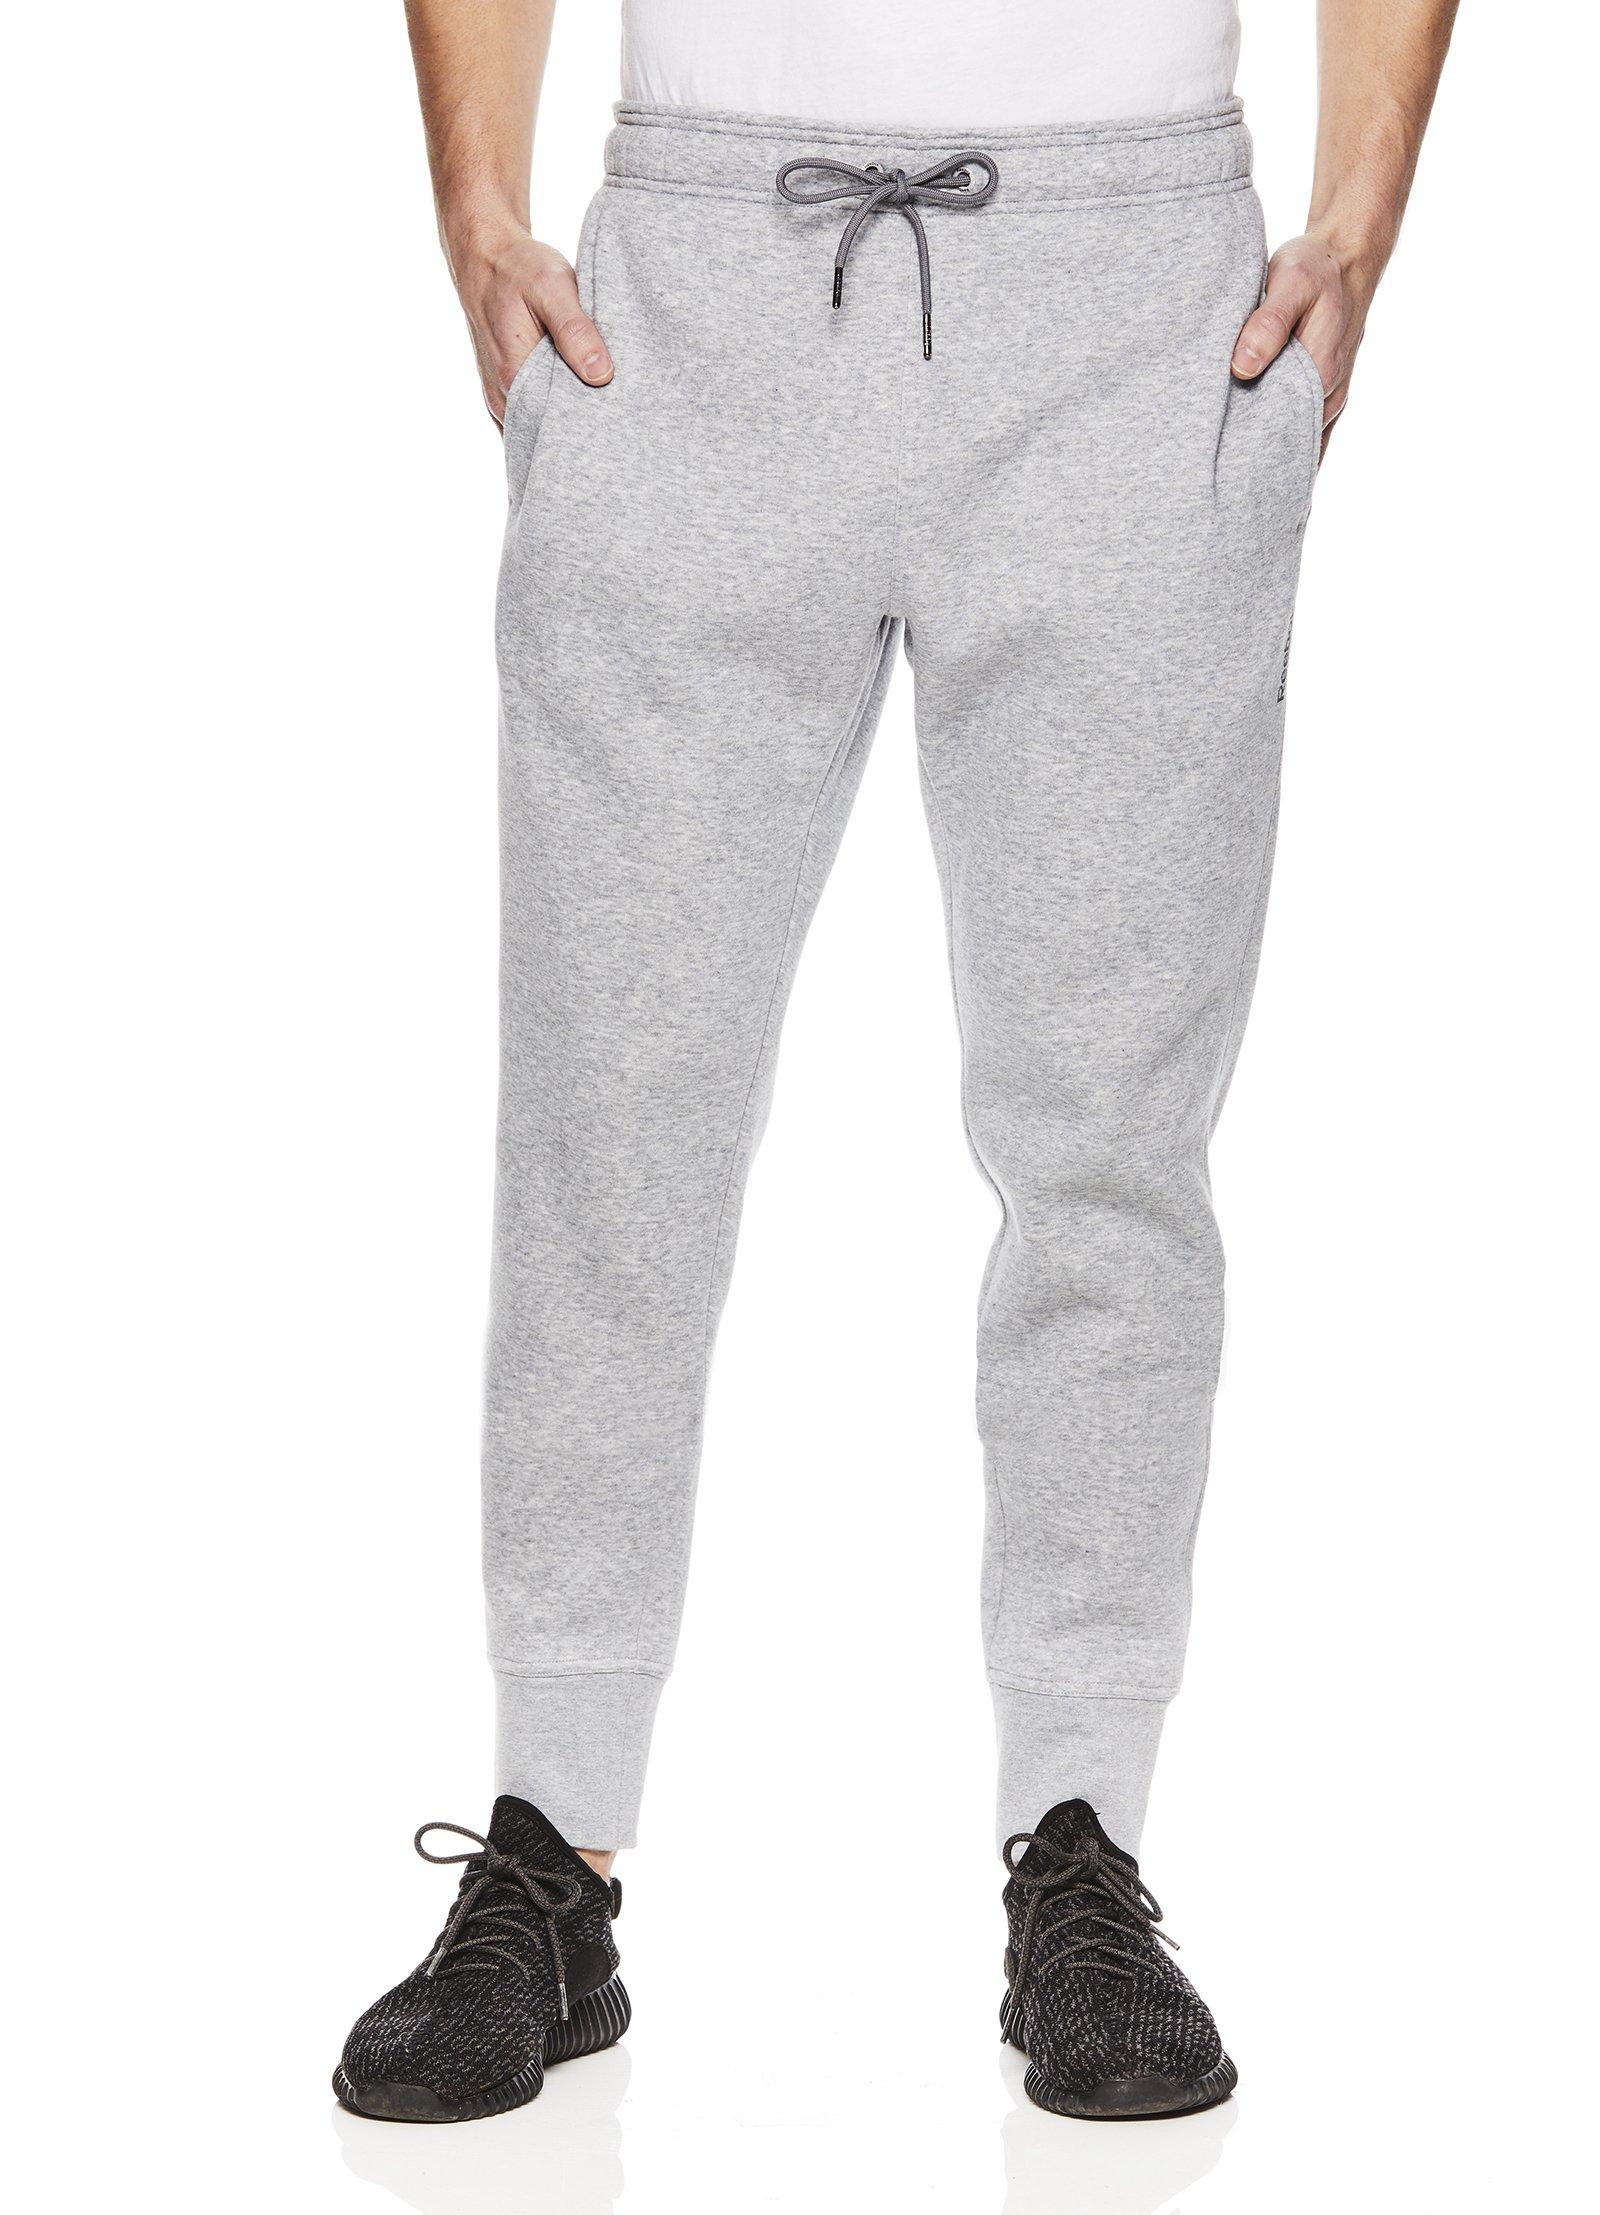 Reebok Men's Core Performance Jogger Workout Pants- Light Grey Ash, Medium